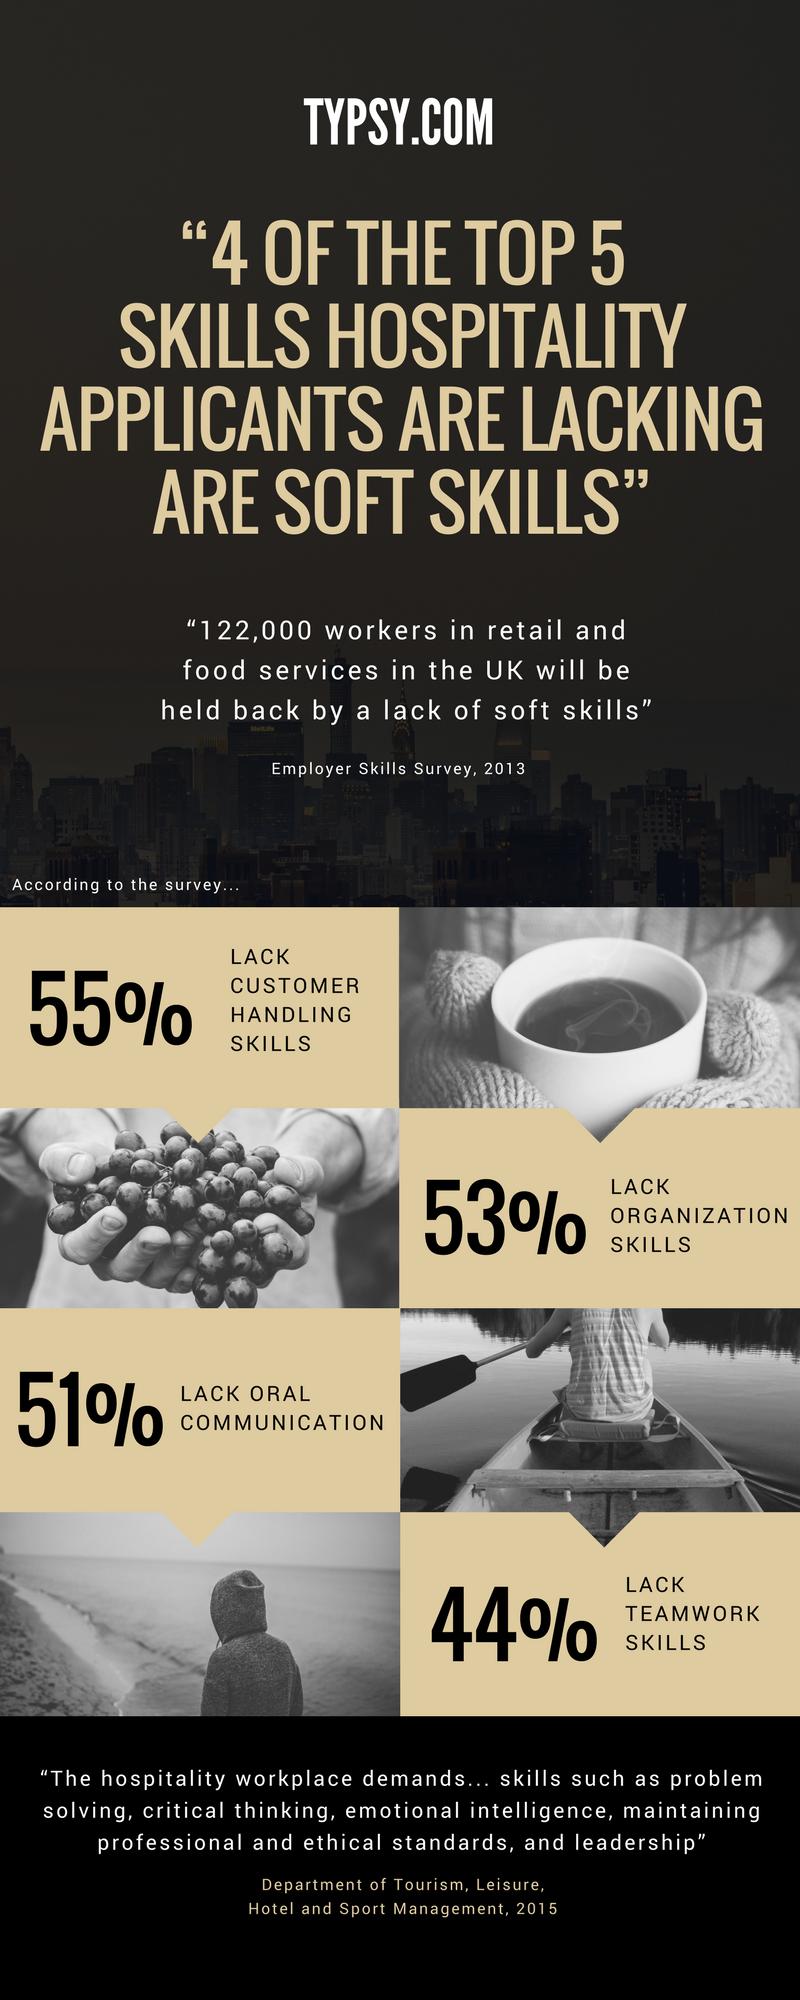 Typsy Hospitality Soft Skills Infographic.png